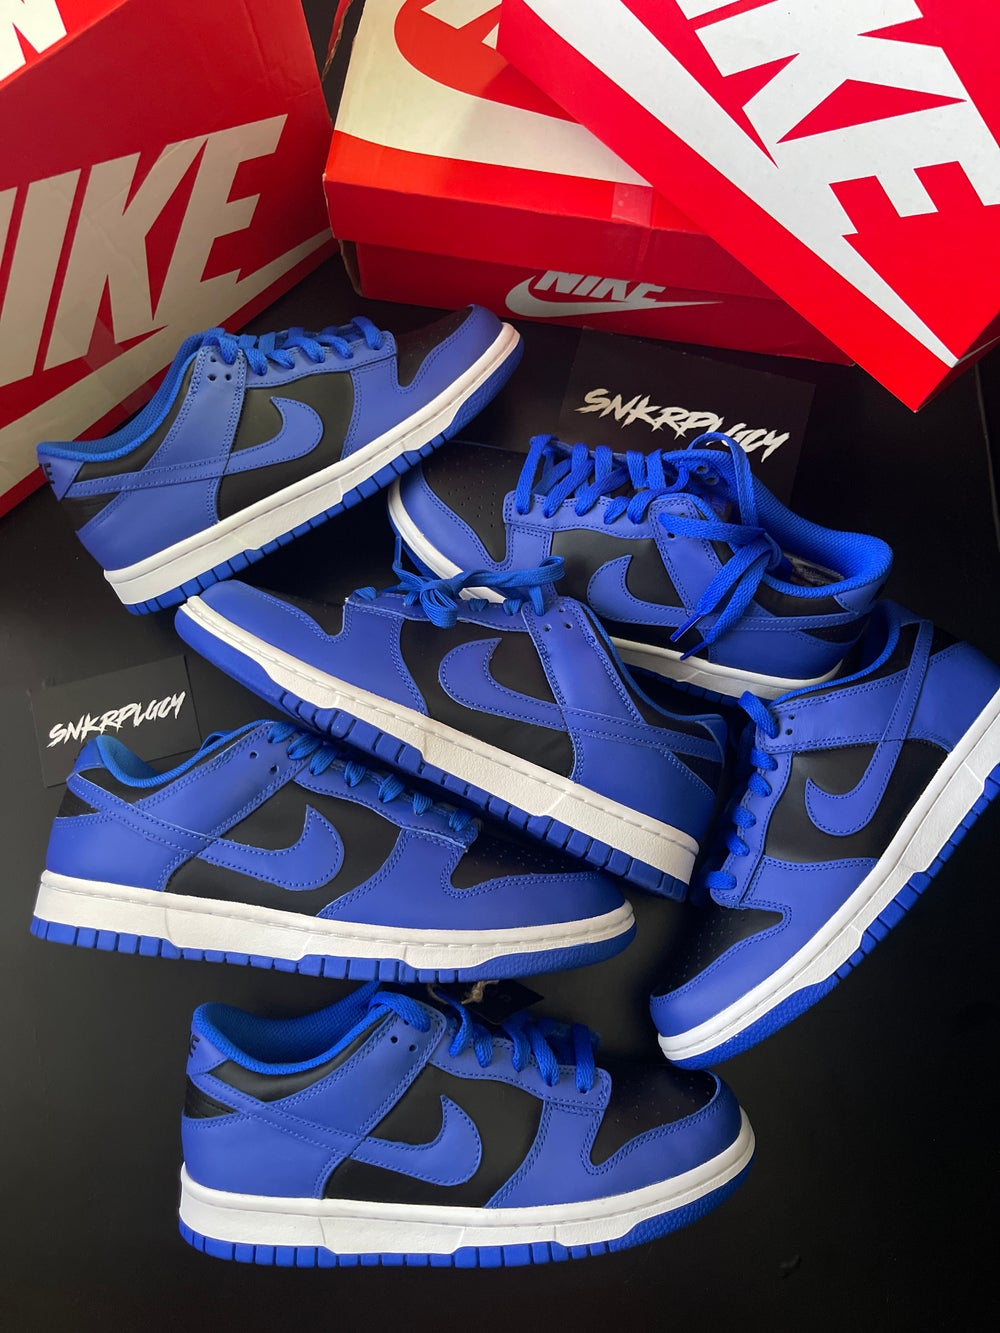 Nike Dunk Low / Cobalt